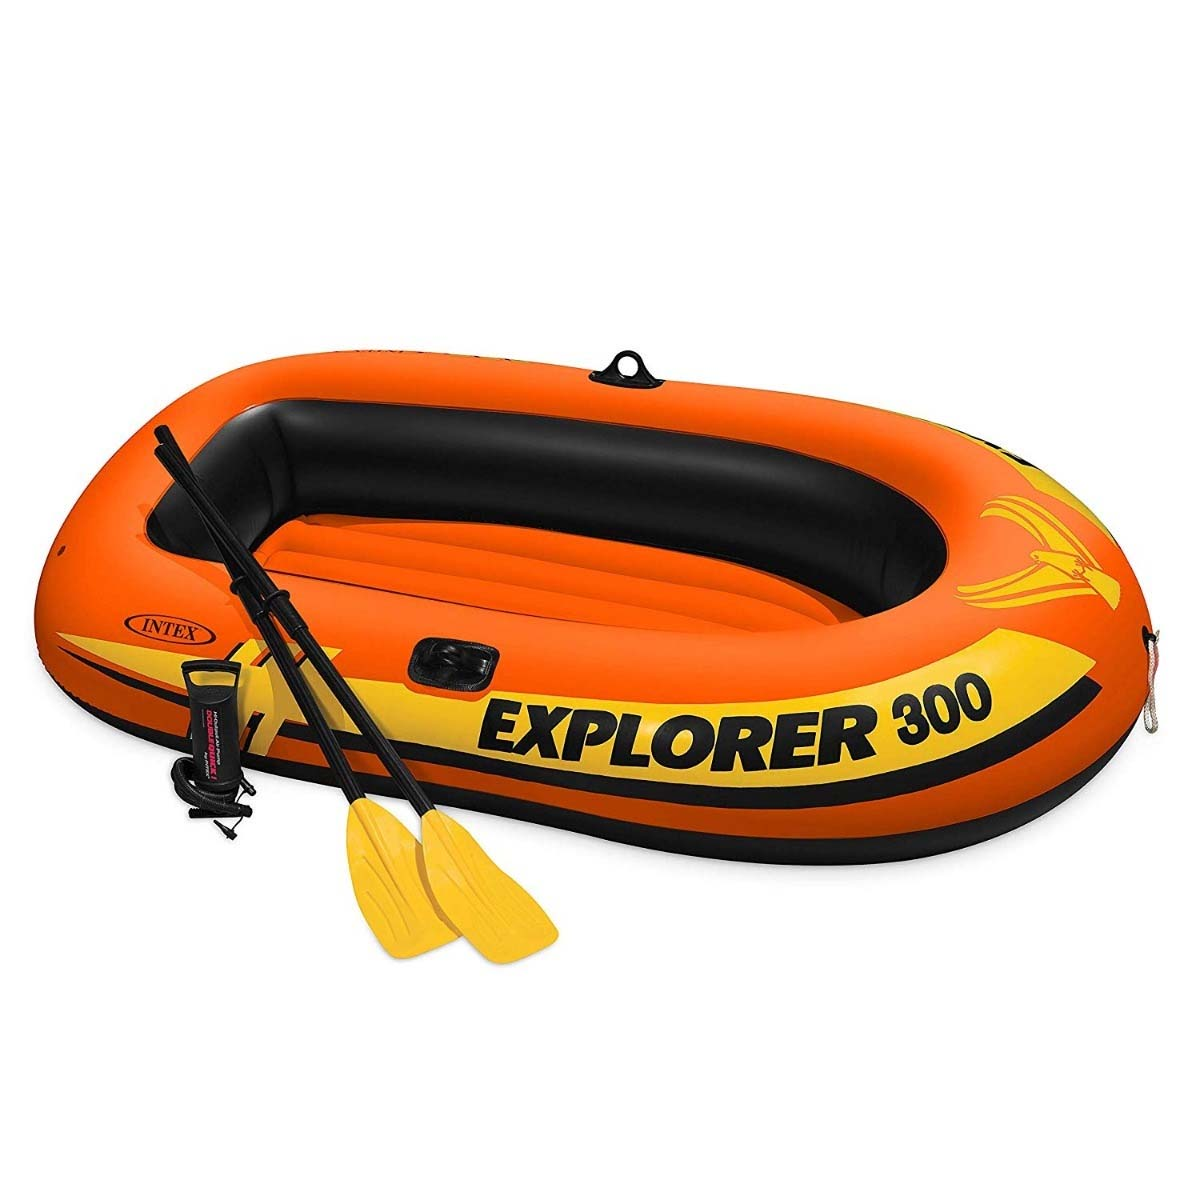 Lancha Inflable Explorer 300 Remos + Bomba 58332NP Rio Intex